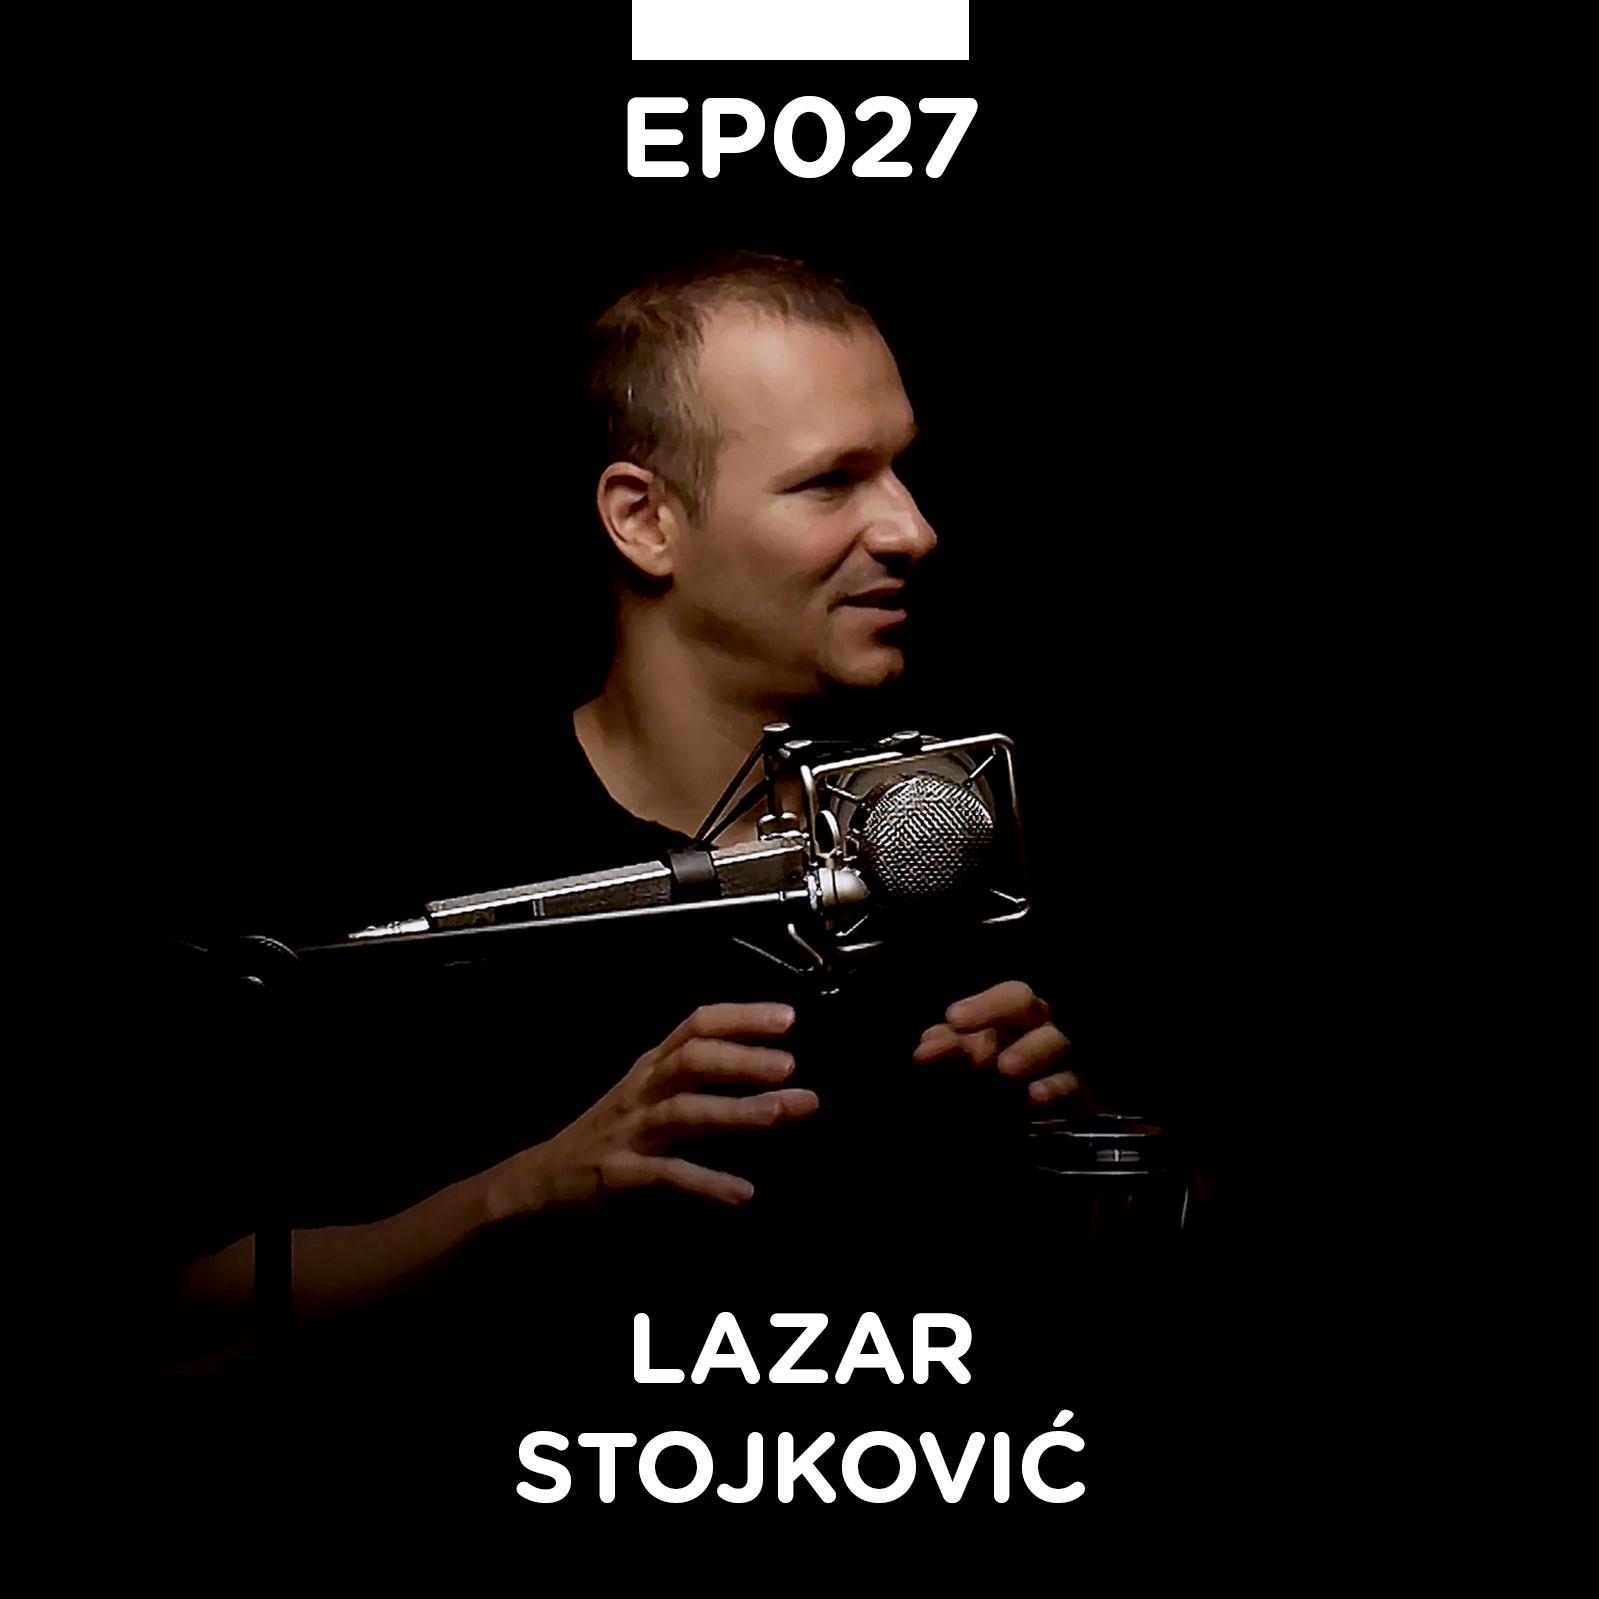 EP 027: Lazar Stojković - Pojačalo podcast